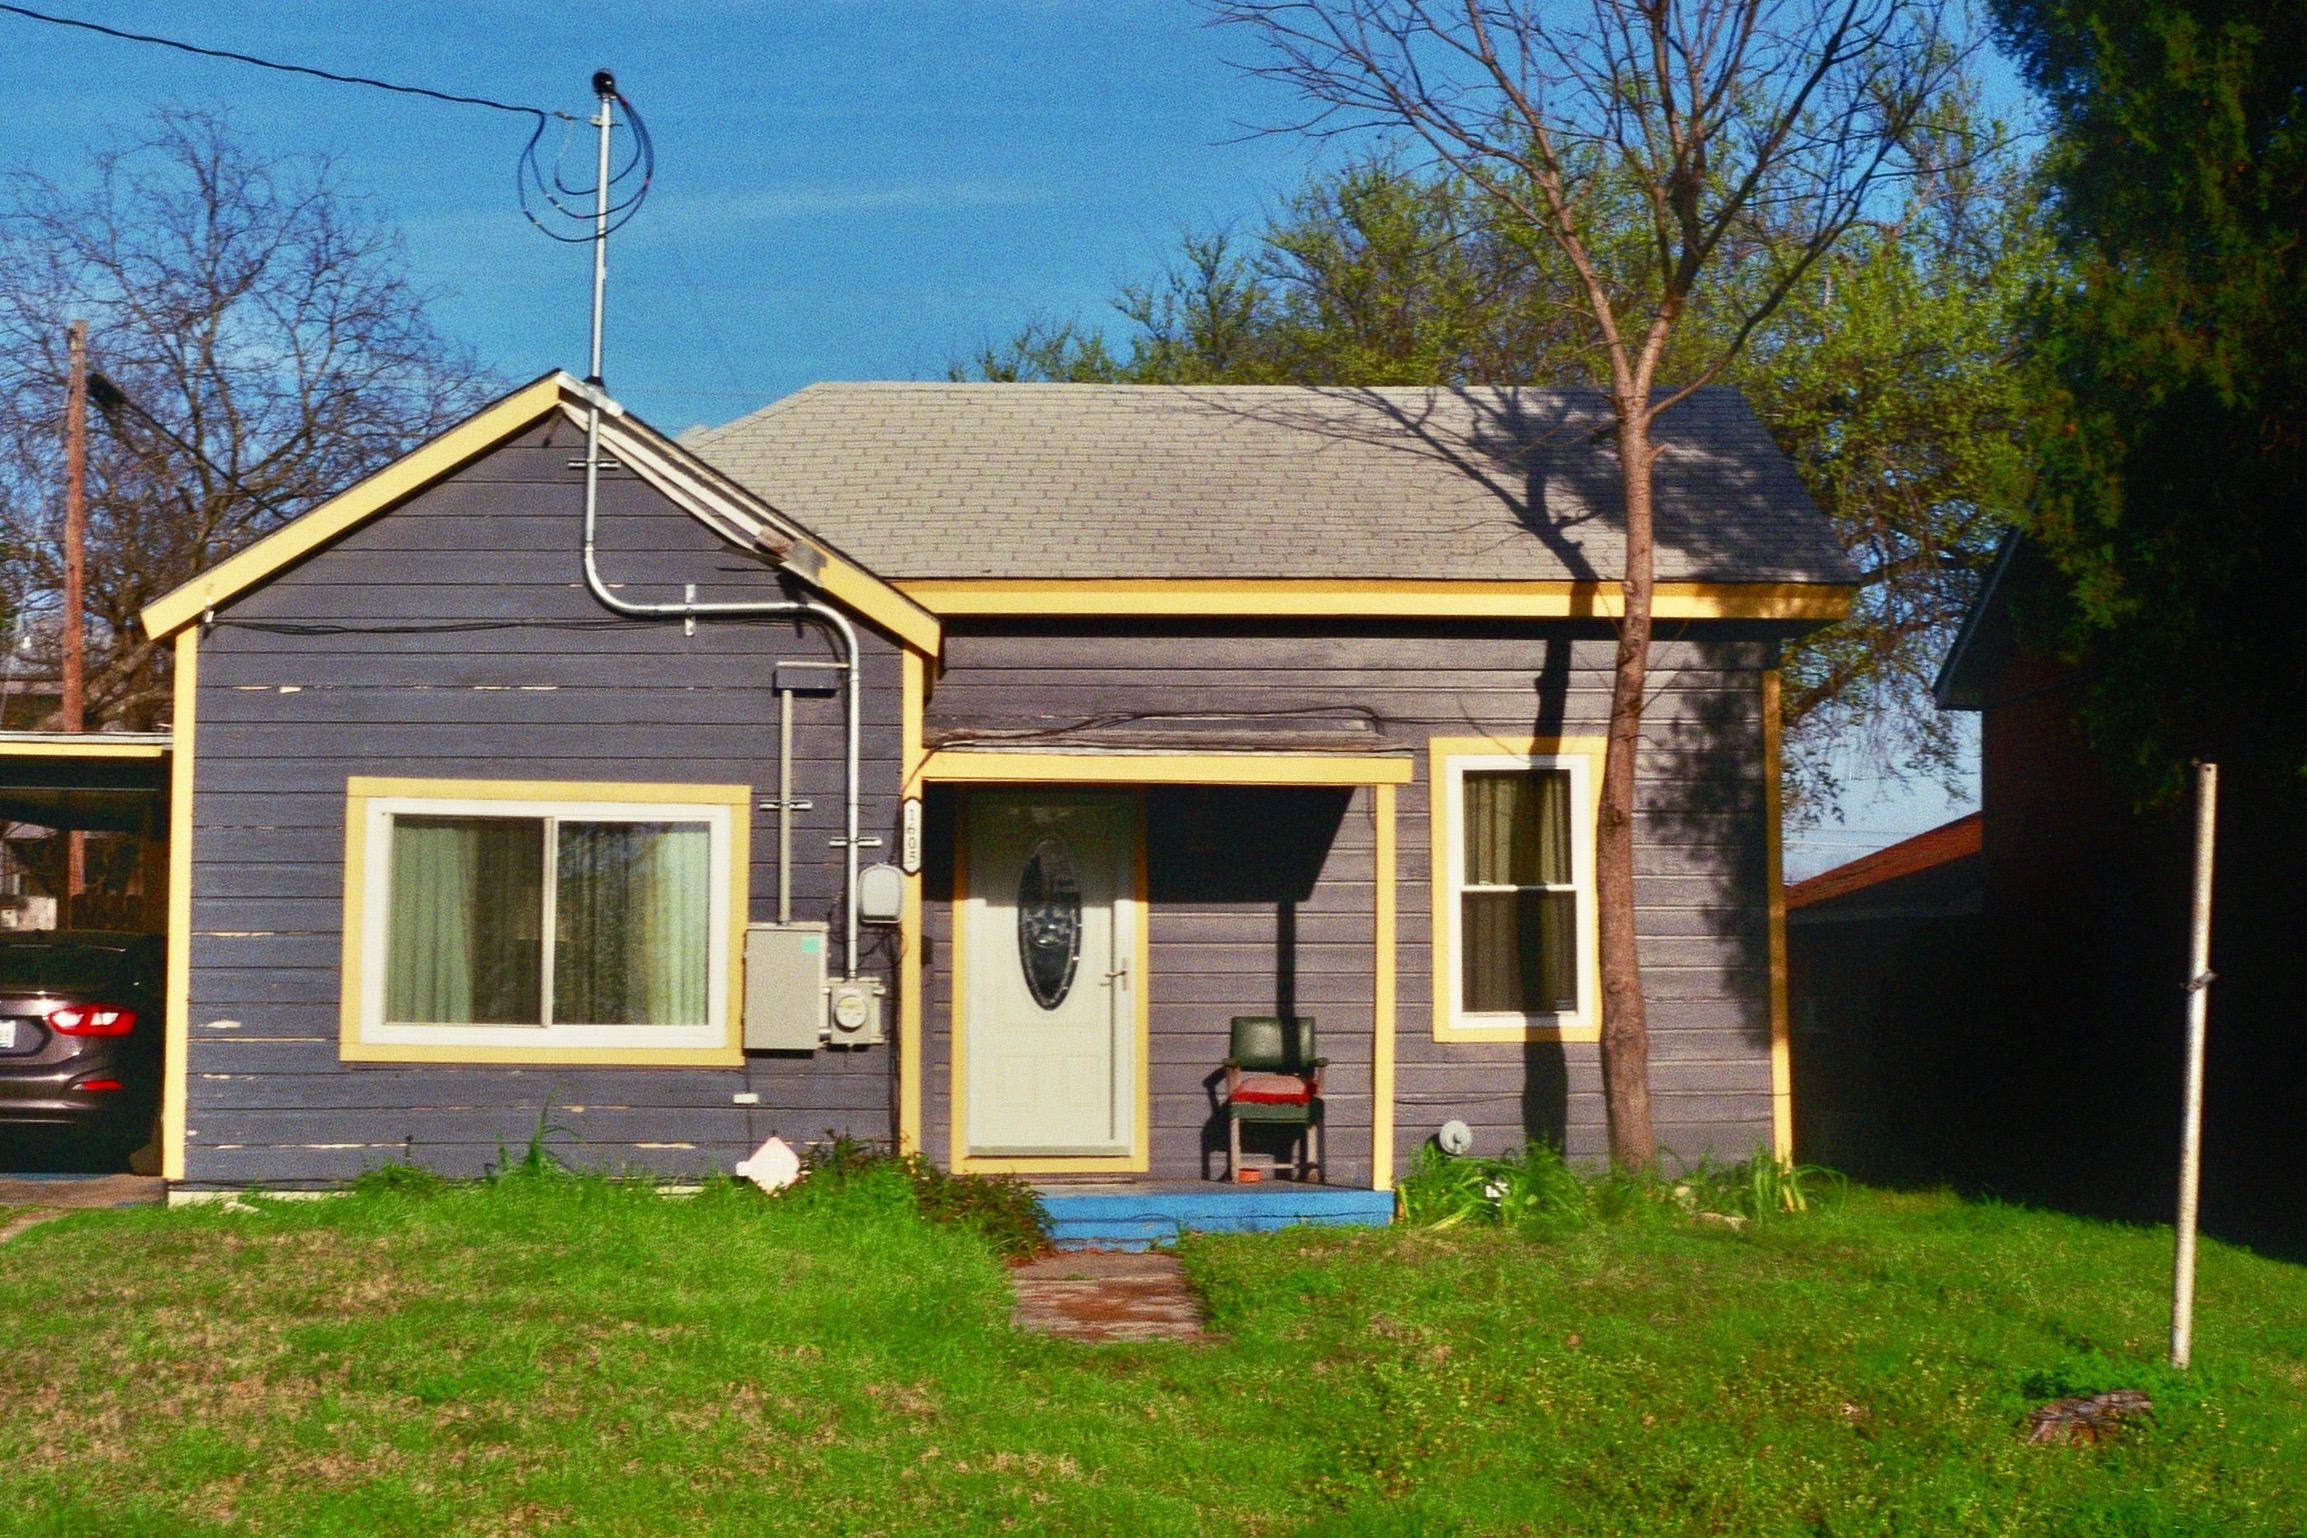 A typical home in East Austin.  Austin, TX